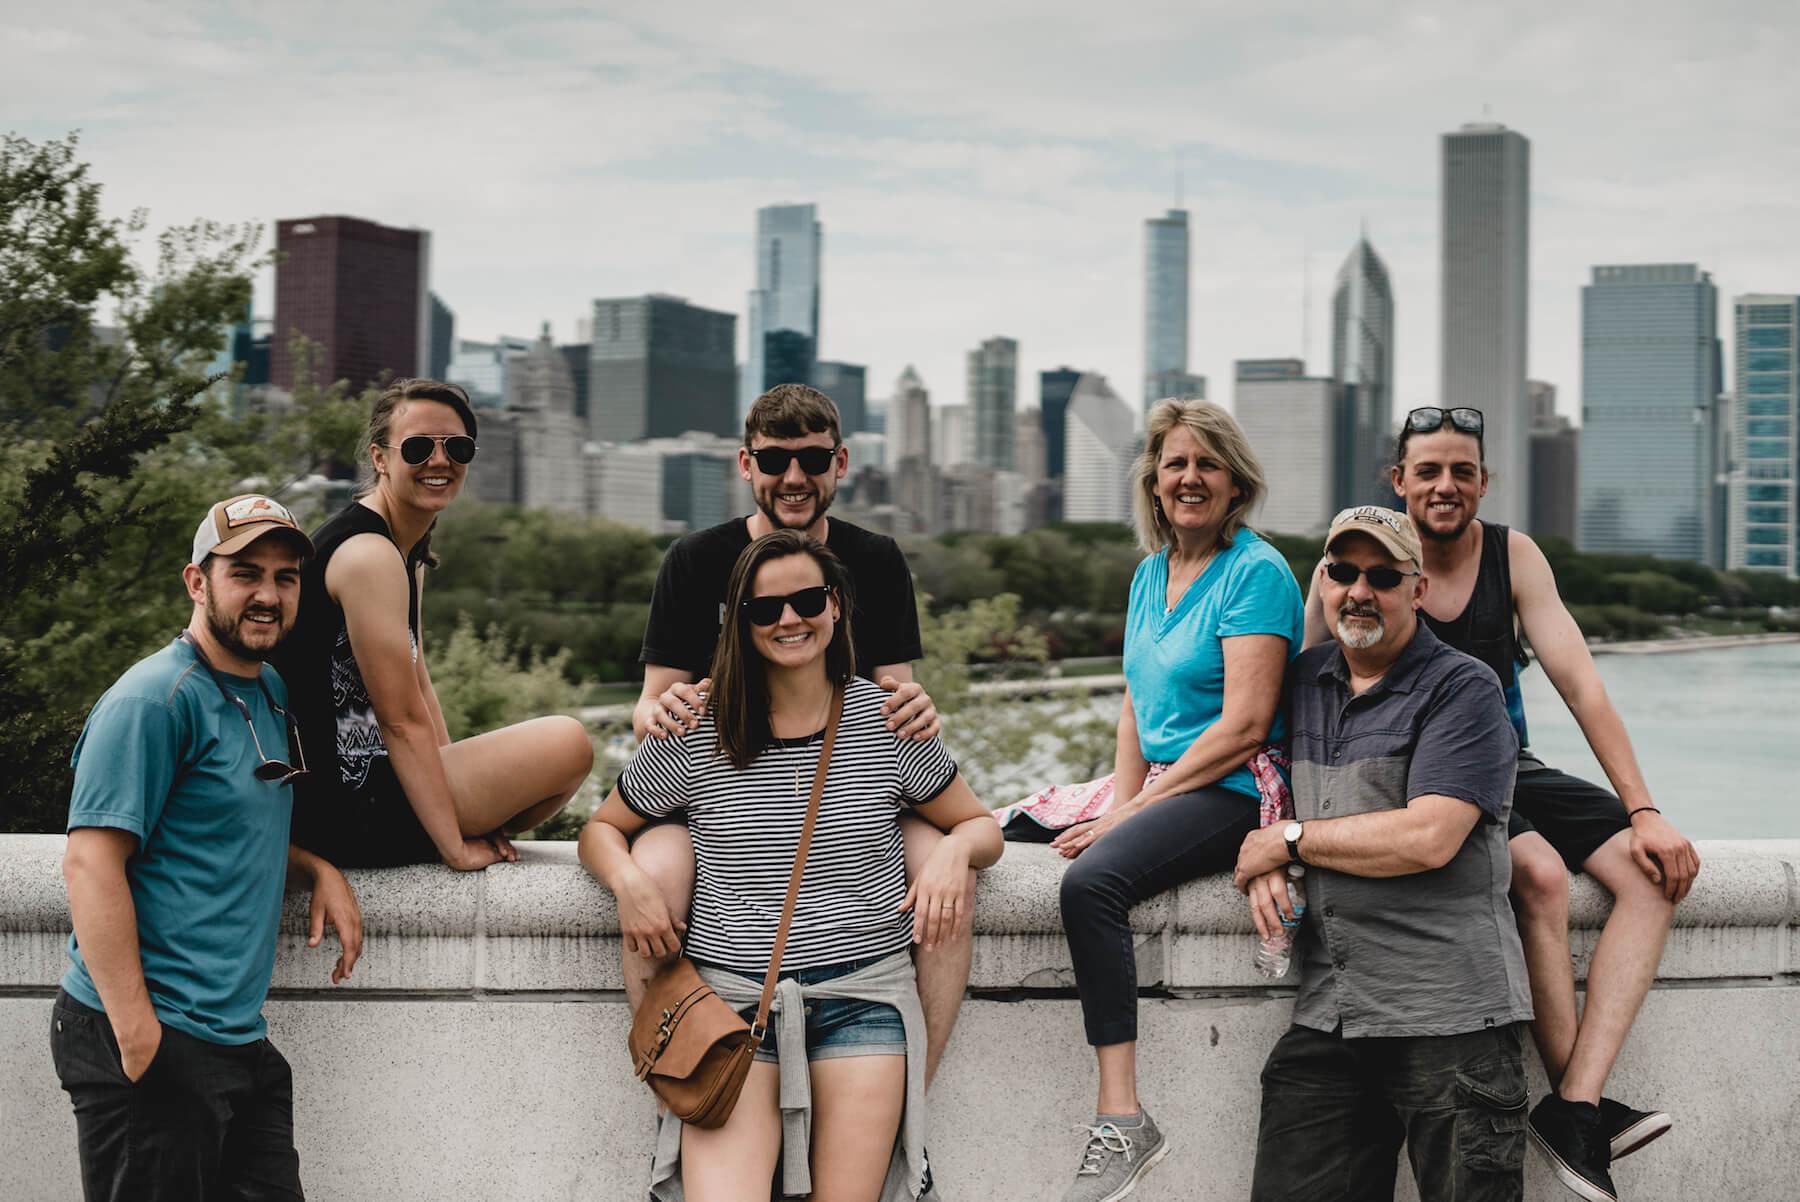 engle-olson-chicago-family-reunion-47.jpg